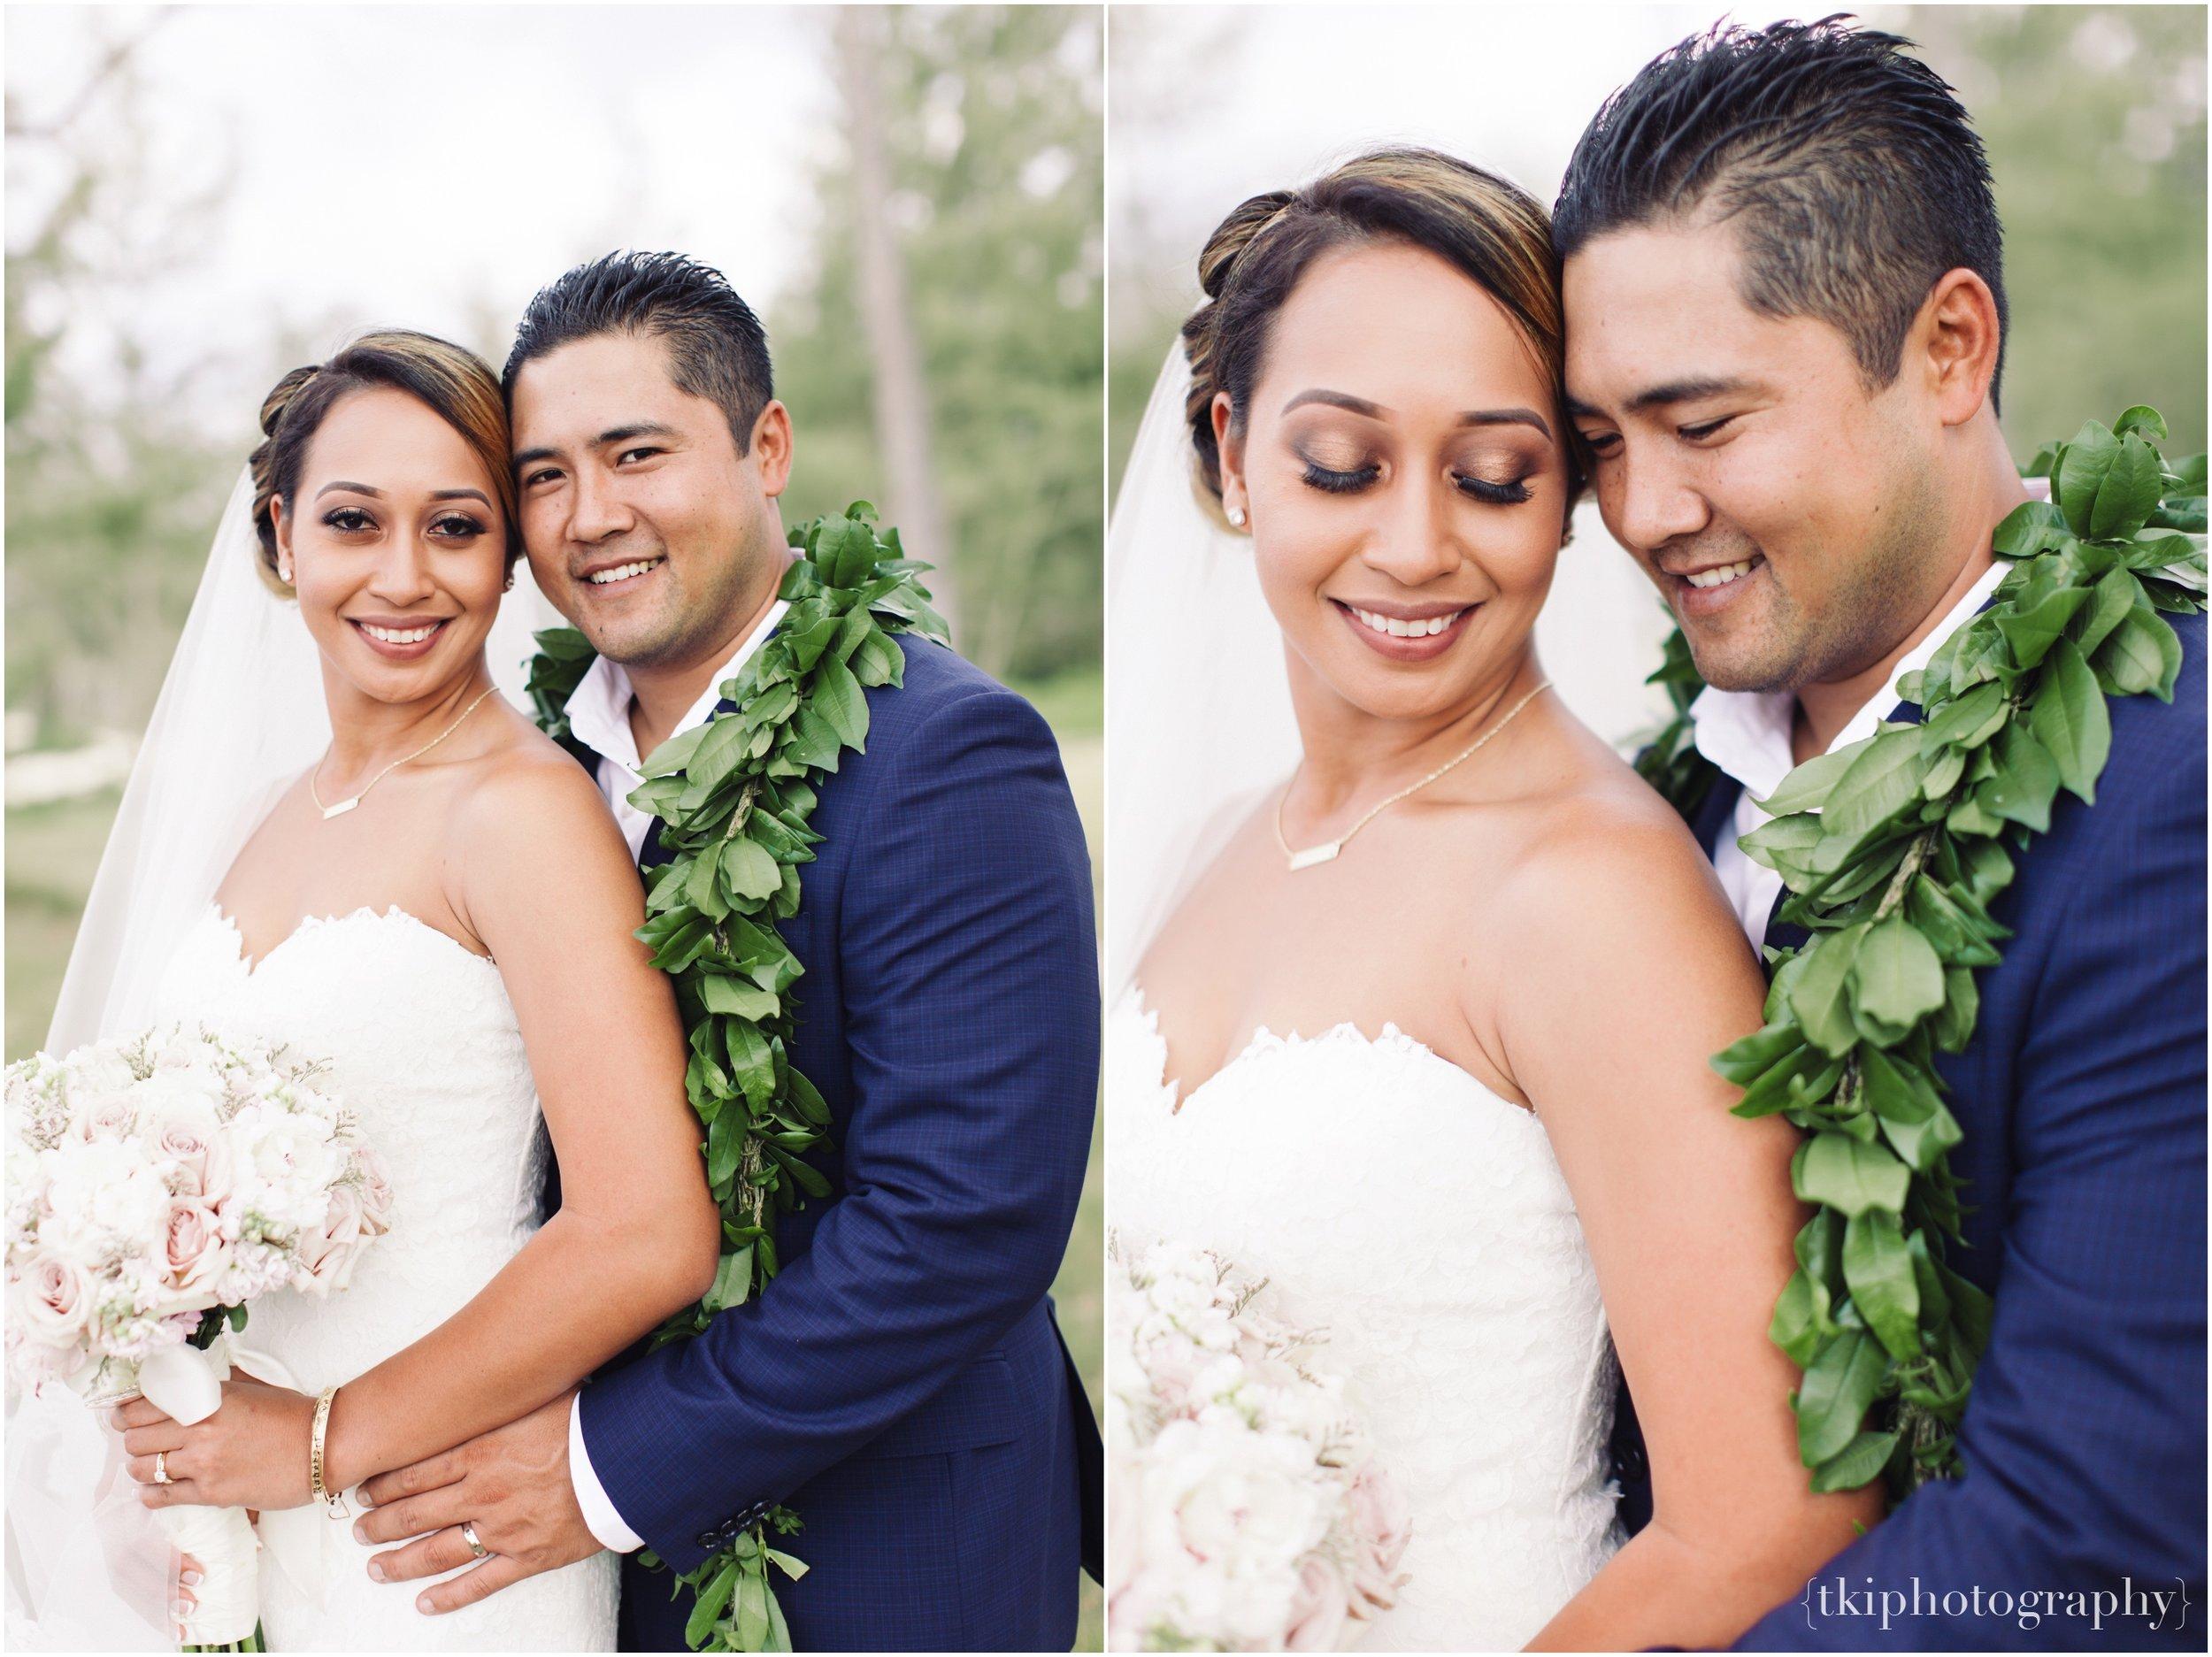 Oahu-Destination-Wedding-Beach_0105.jpg